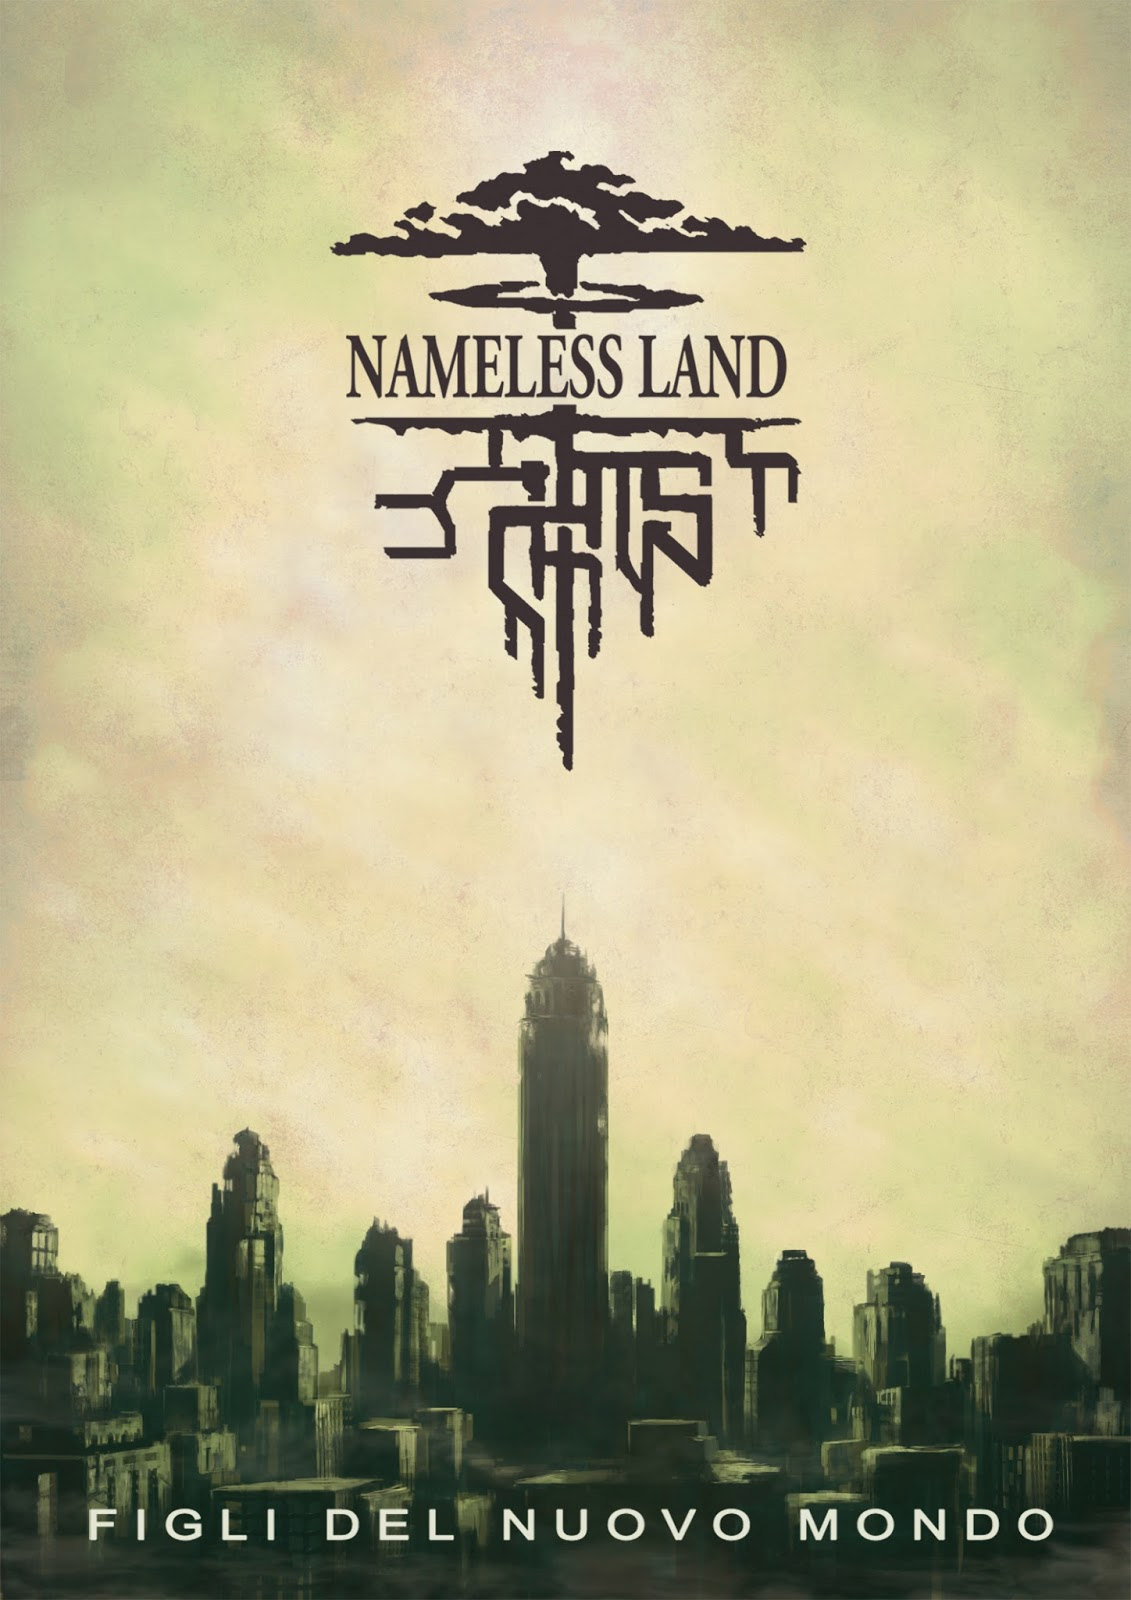 La copertina di Nameless Land